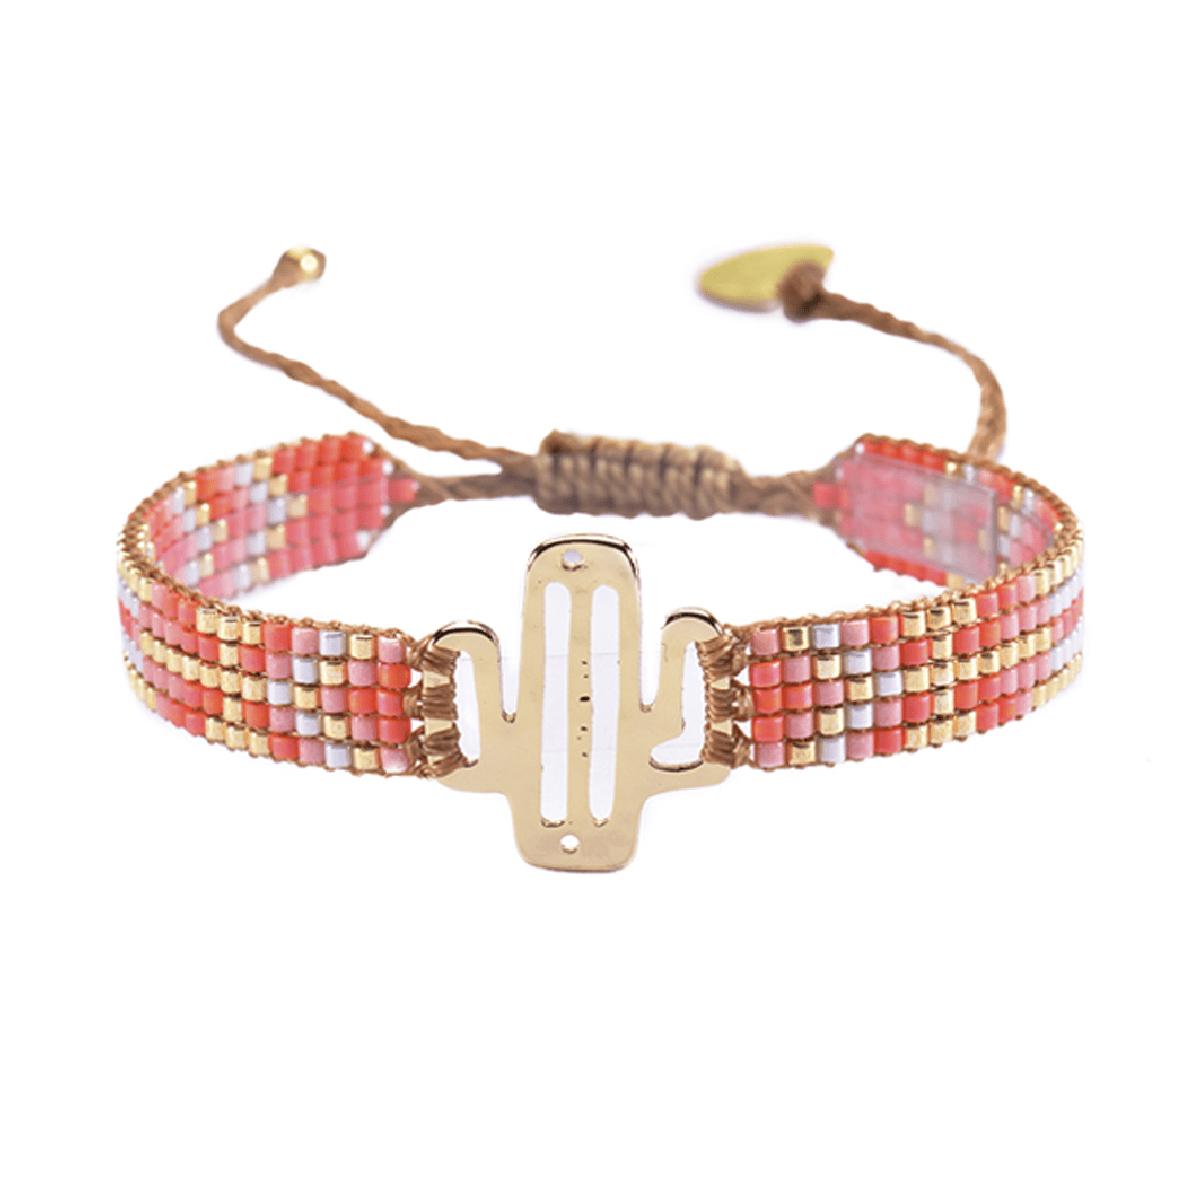 MISHKY, Bracelet Mini Cactus en perles multicolores corail, rose & or - cassisroyal.com